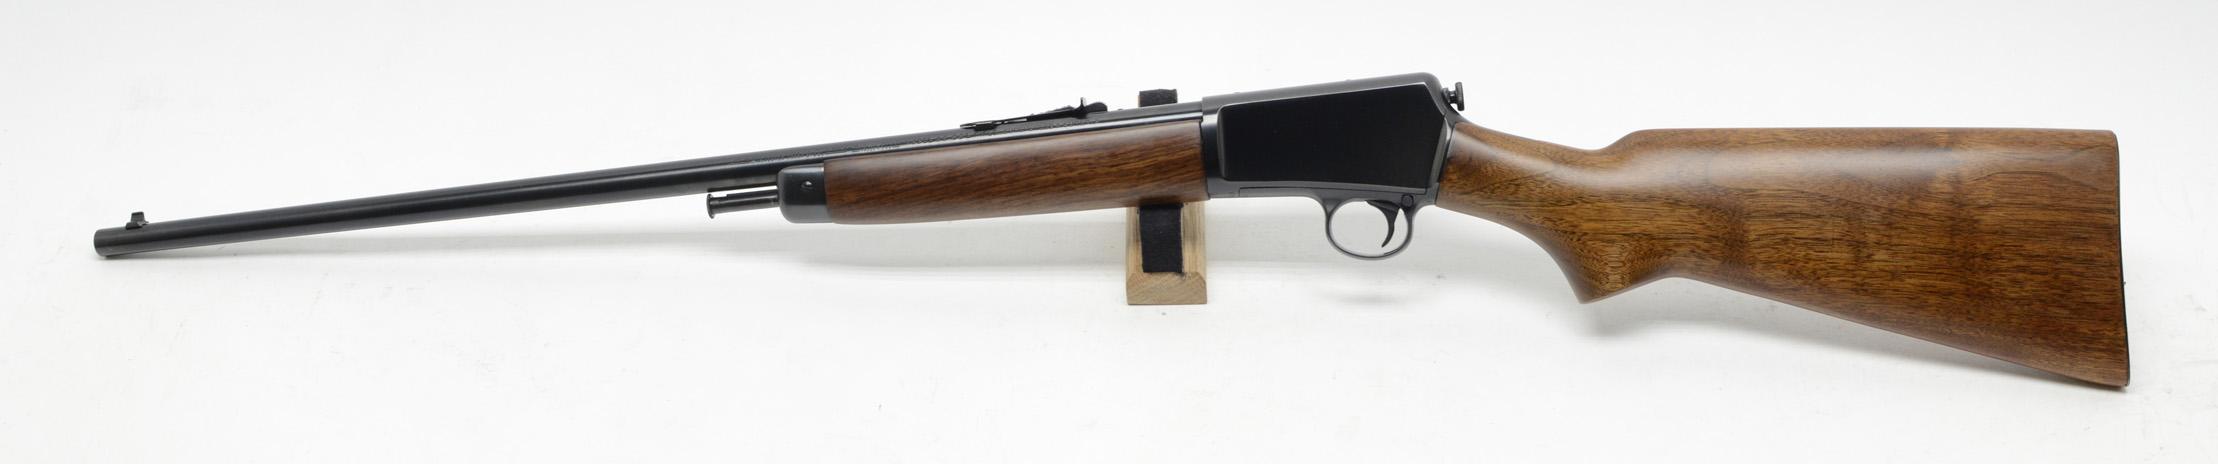 winchester model 63